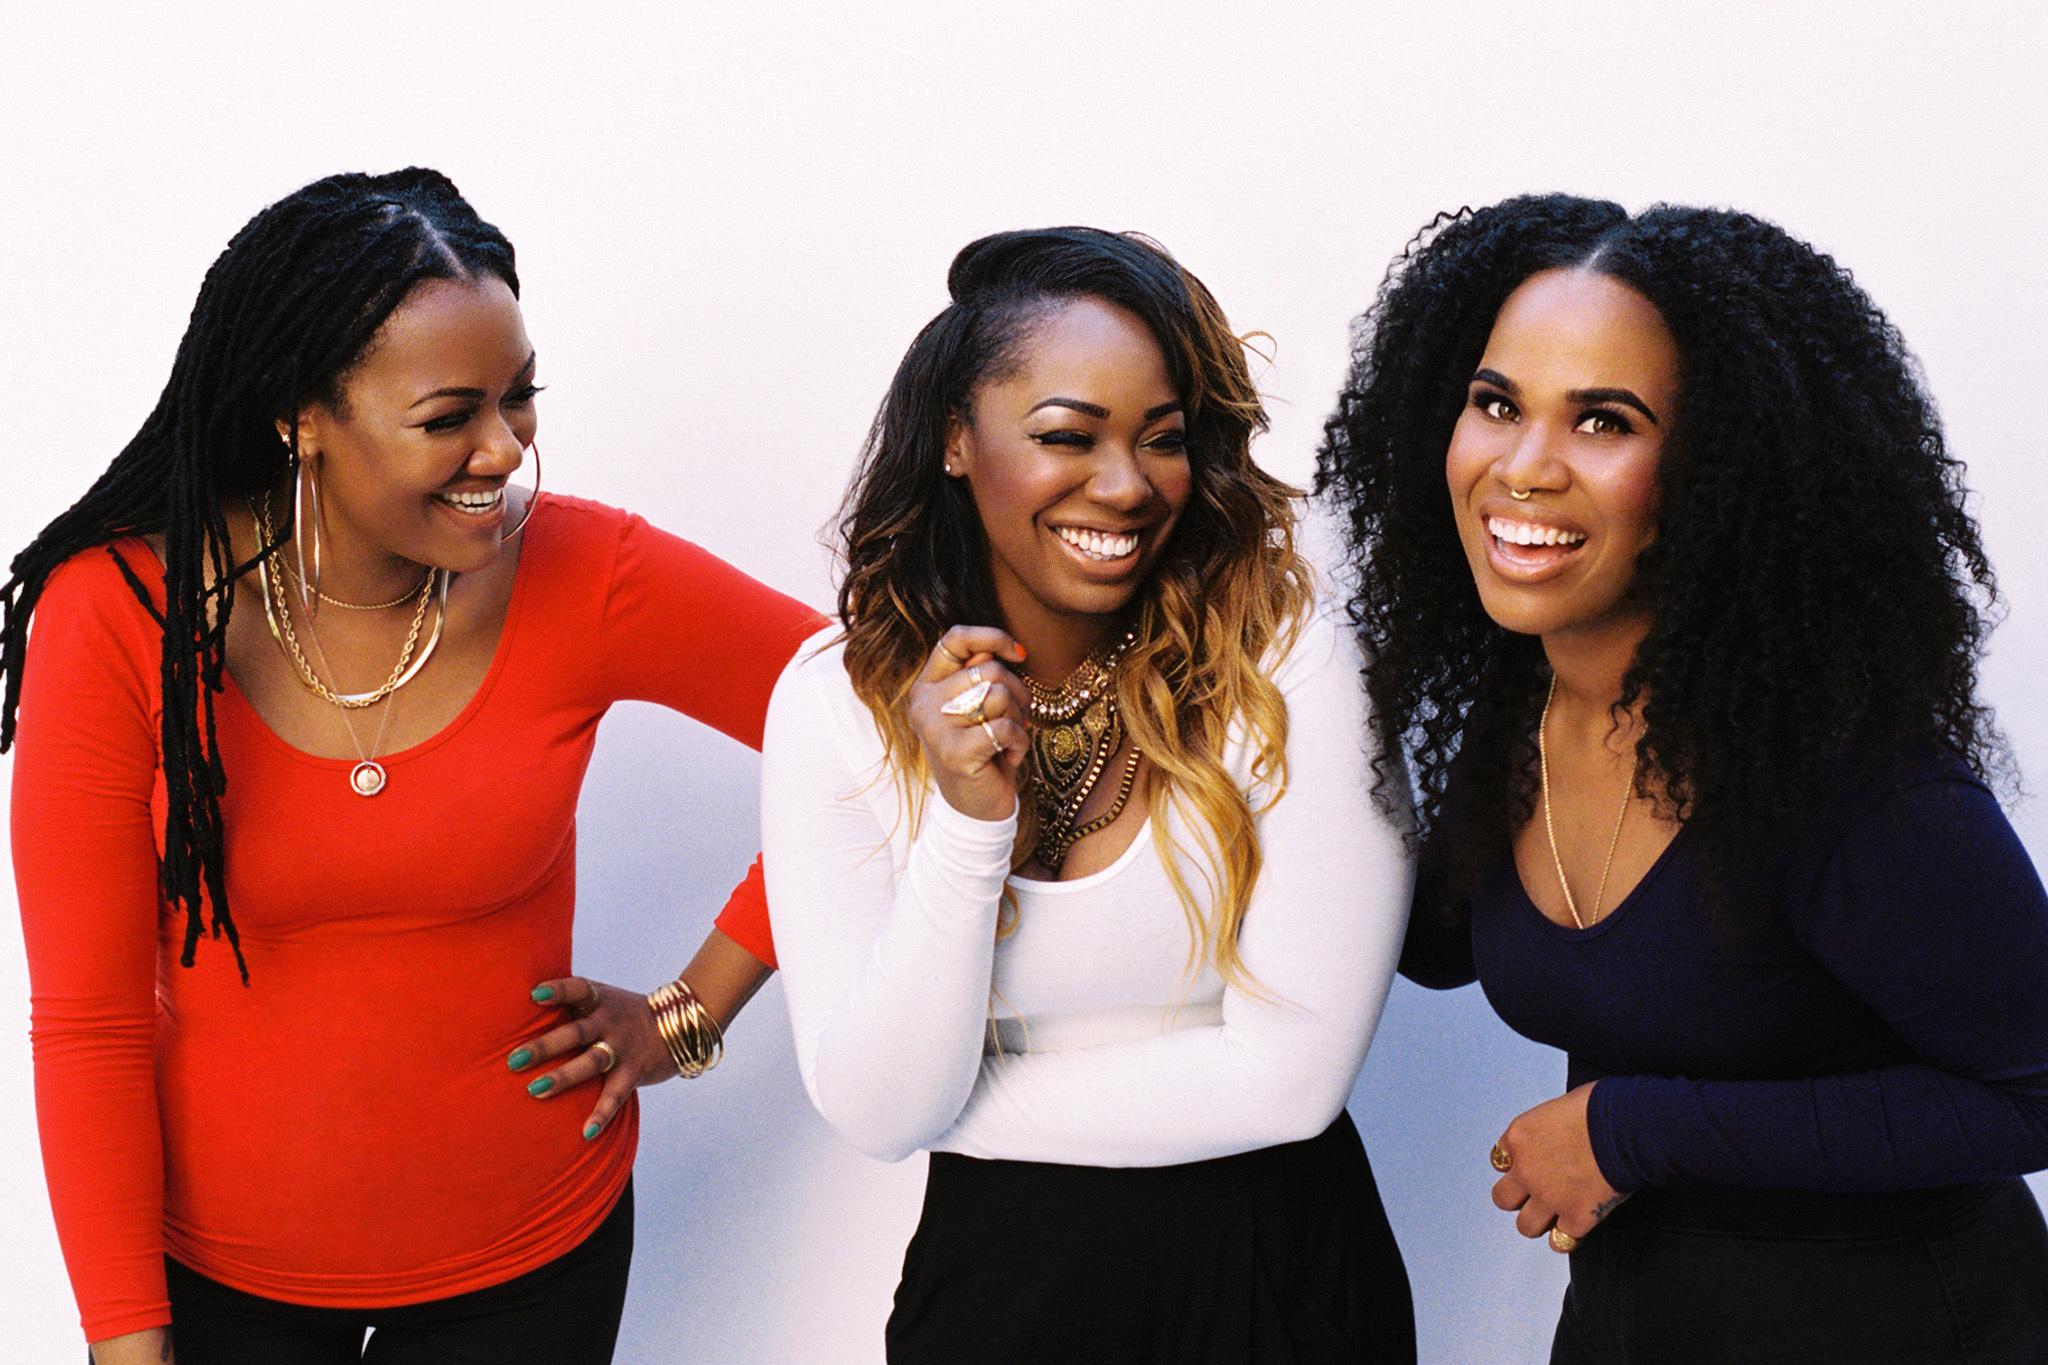 Rising R&B stars King bring their funk-laden music to Afropunk